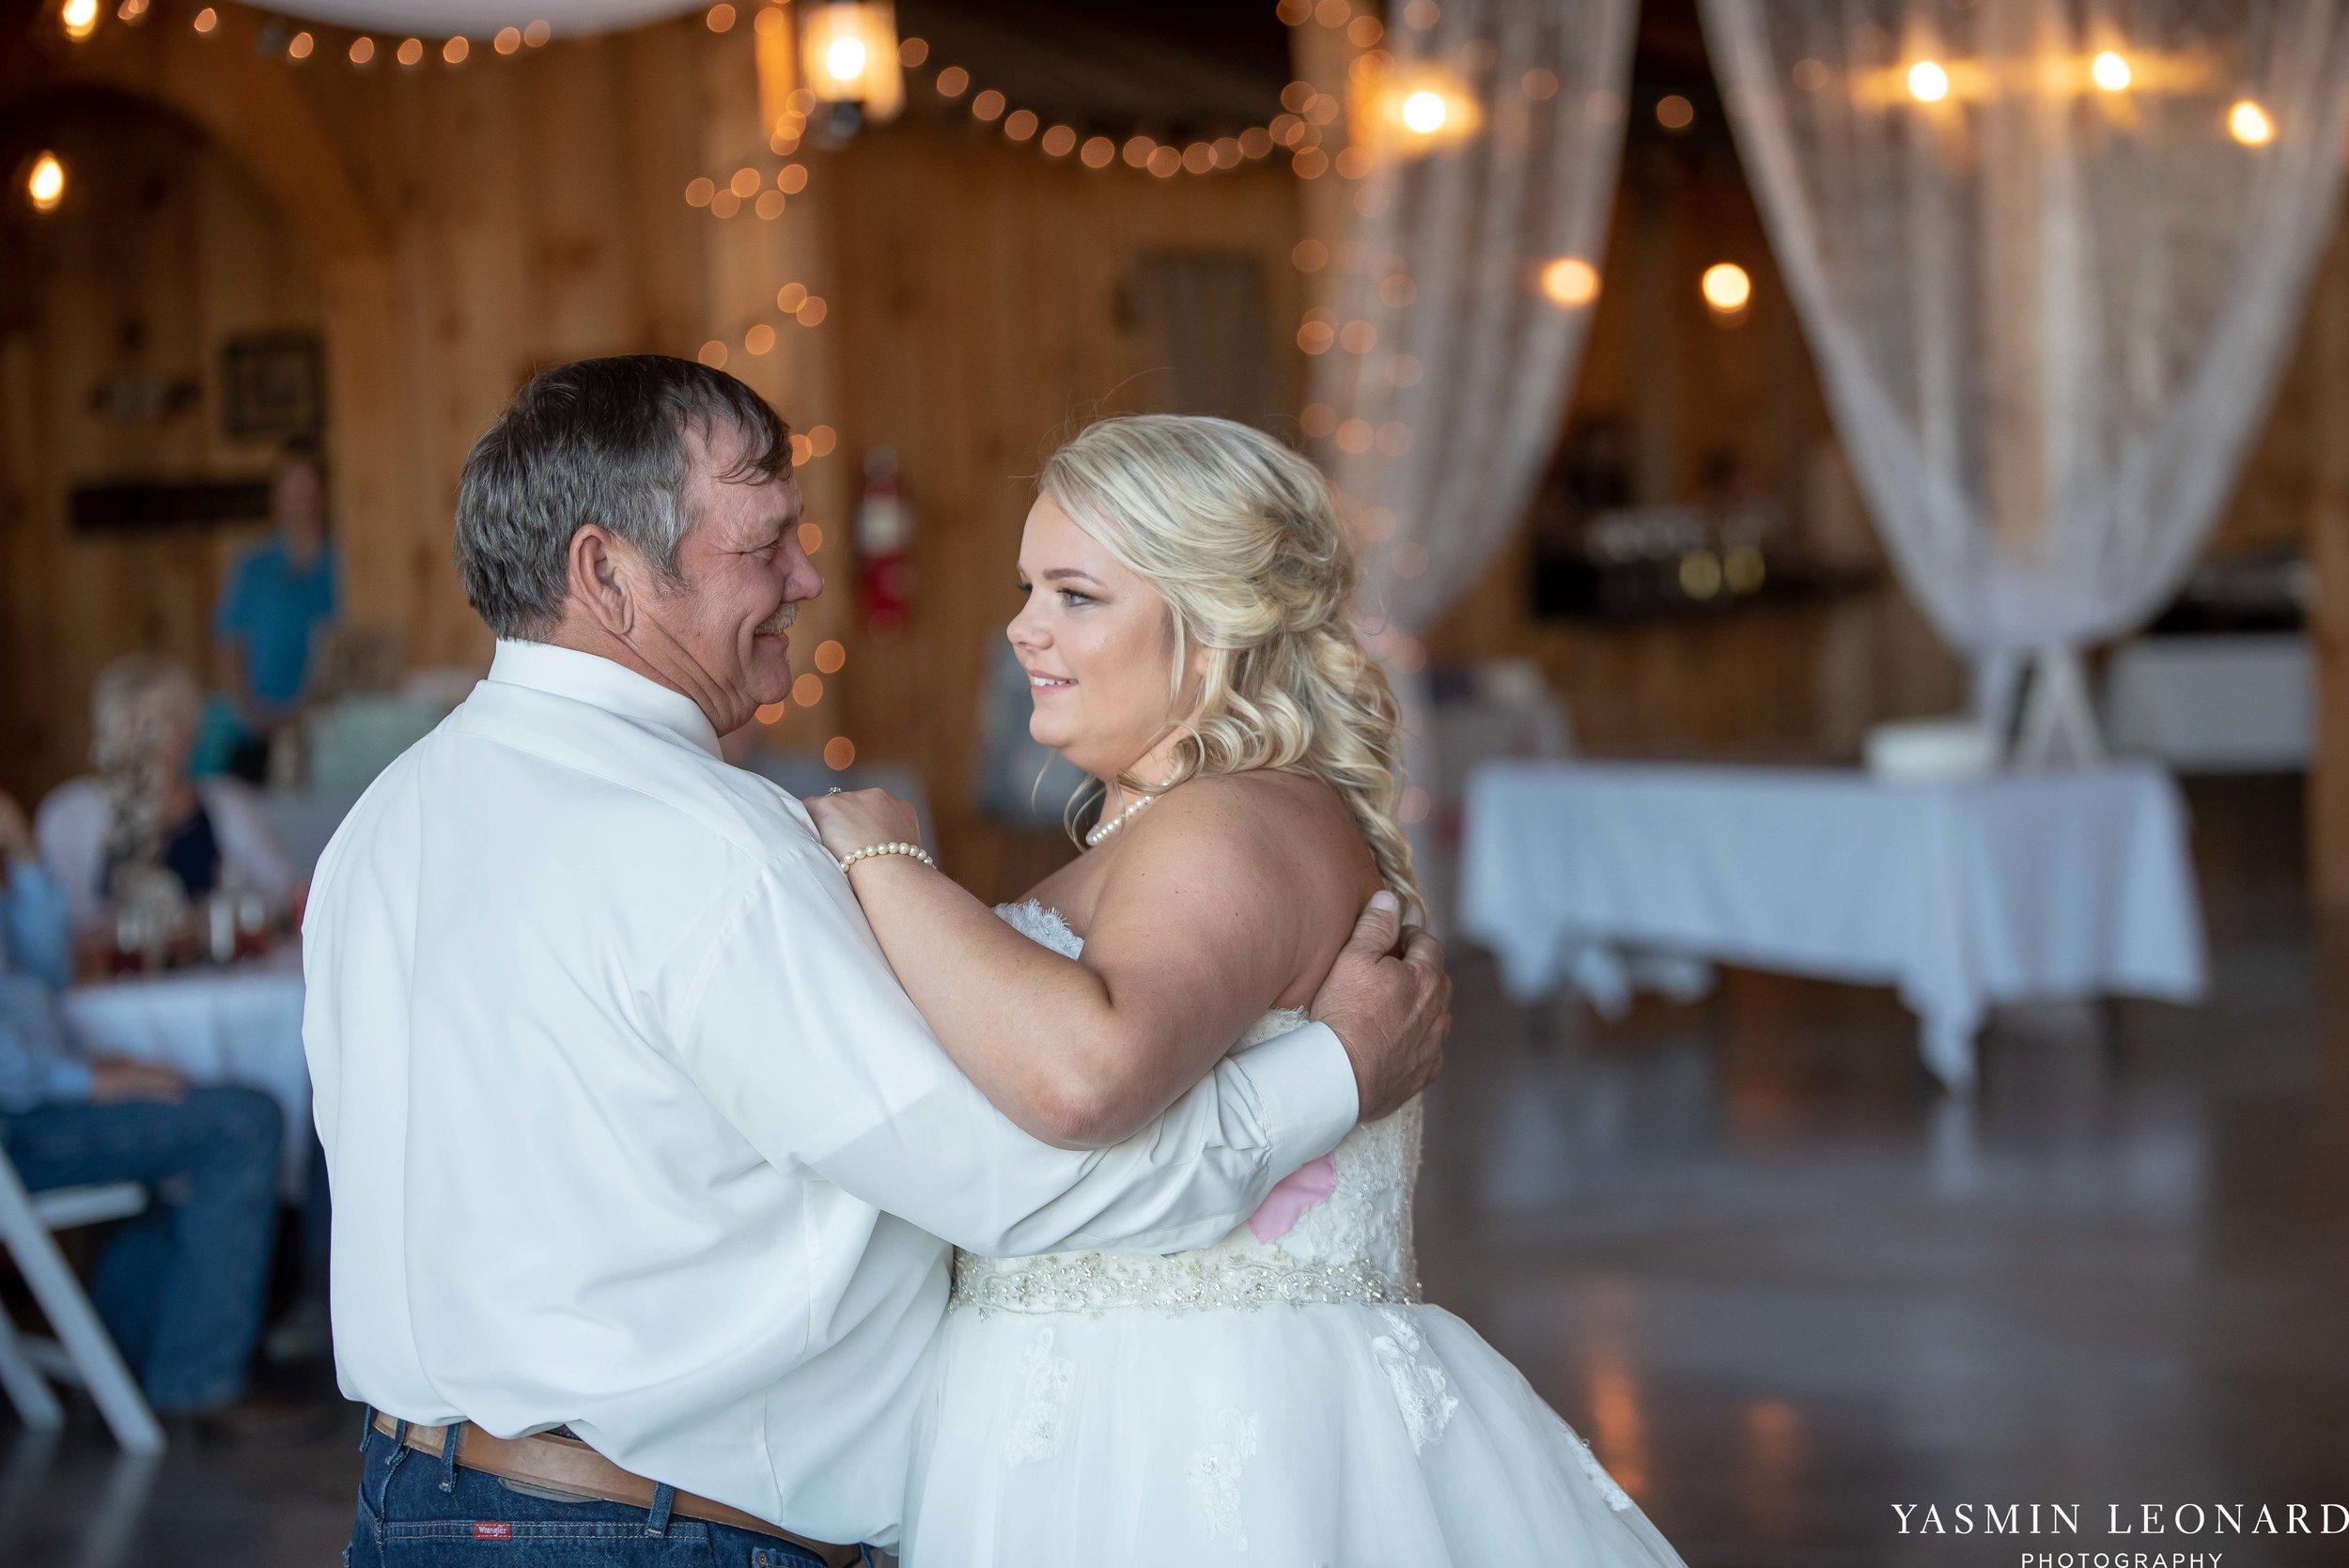 The Barn at Heritage Farm - Country Wedding - Pink and Blue Wedding - Barn Wedding - Outdoor Wedding - Cotton and Wheat Decor - Groom in Bibs - Pink Bridal Colors - Yasmin Leonard Photography-26.jpg